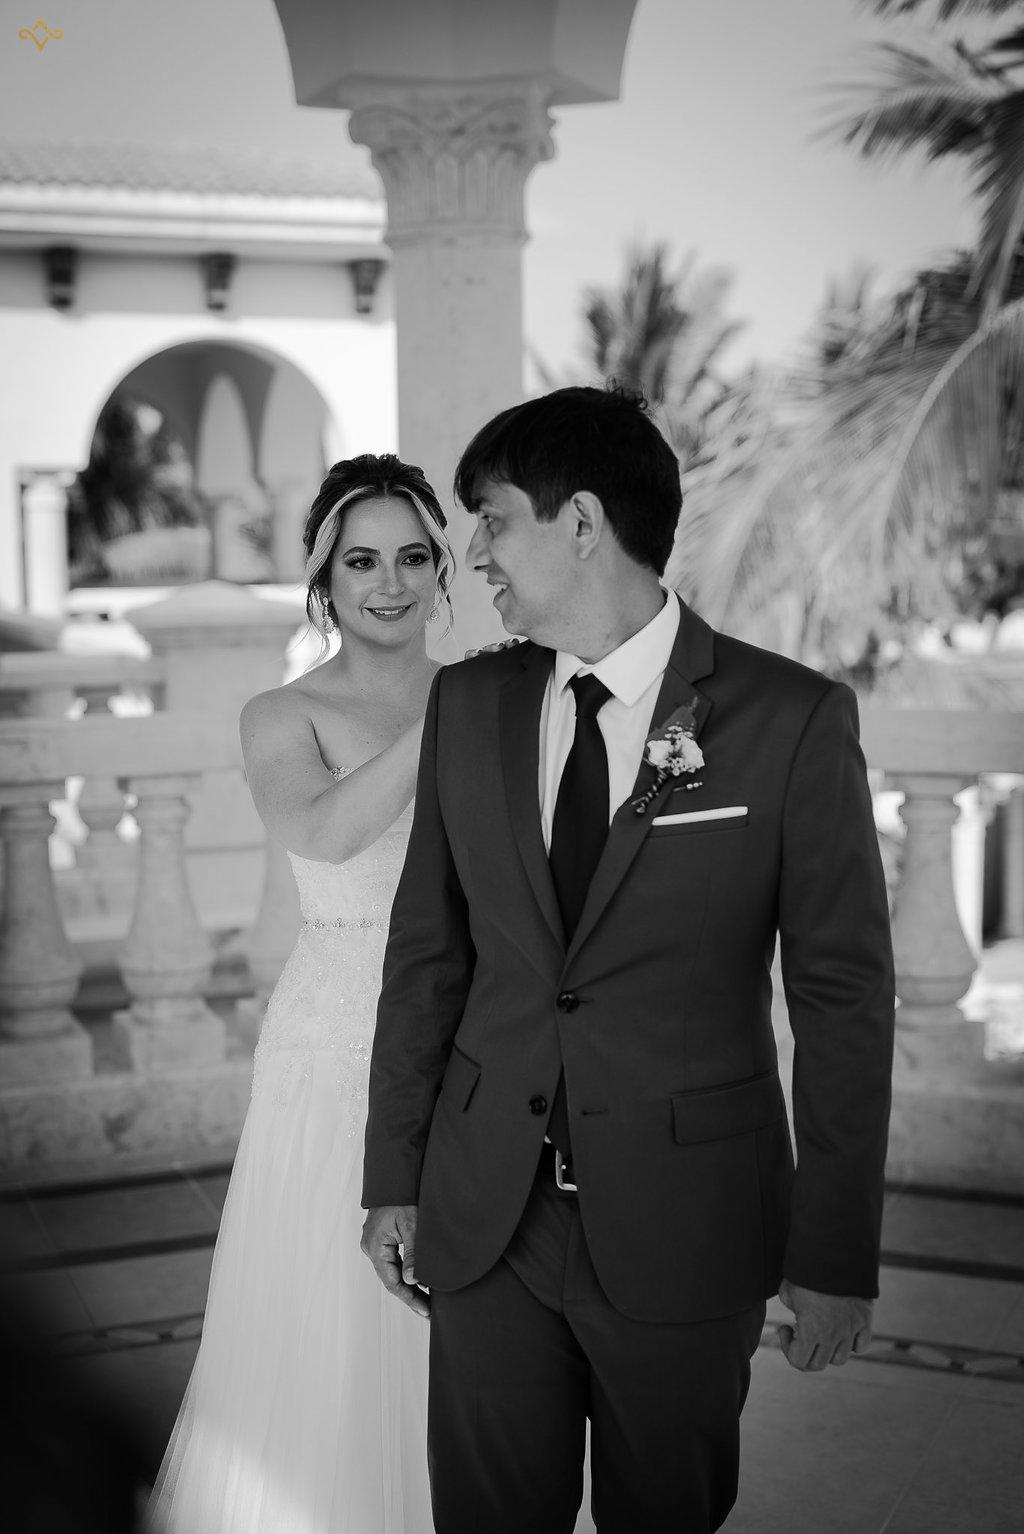 cancun-destination-wedding-mexico-villa-la-joya-12.jpg